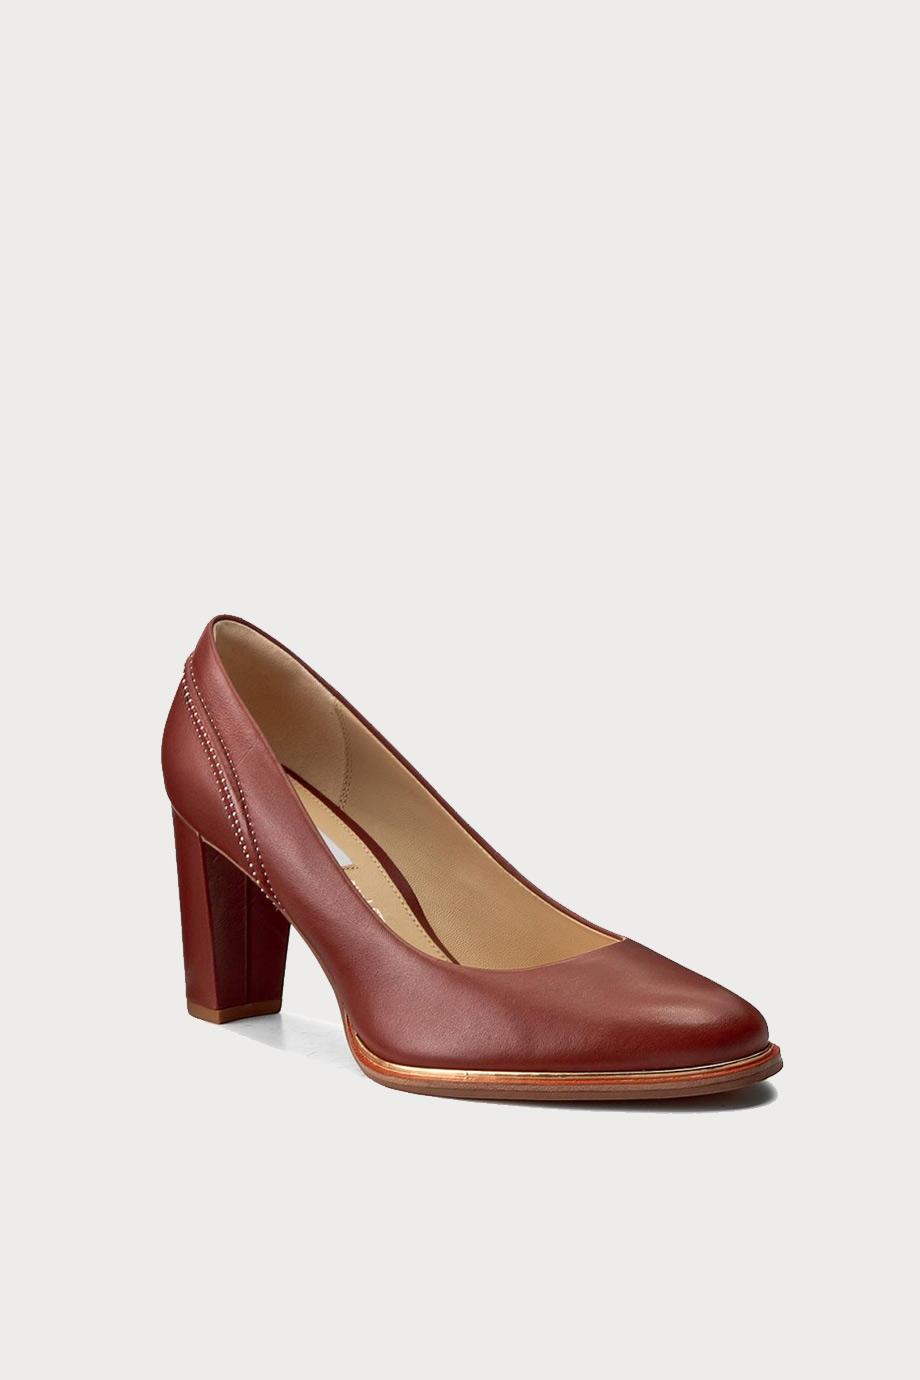 spiridoula metheniti shoes xalkida p Ellis Edith clarks 1